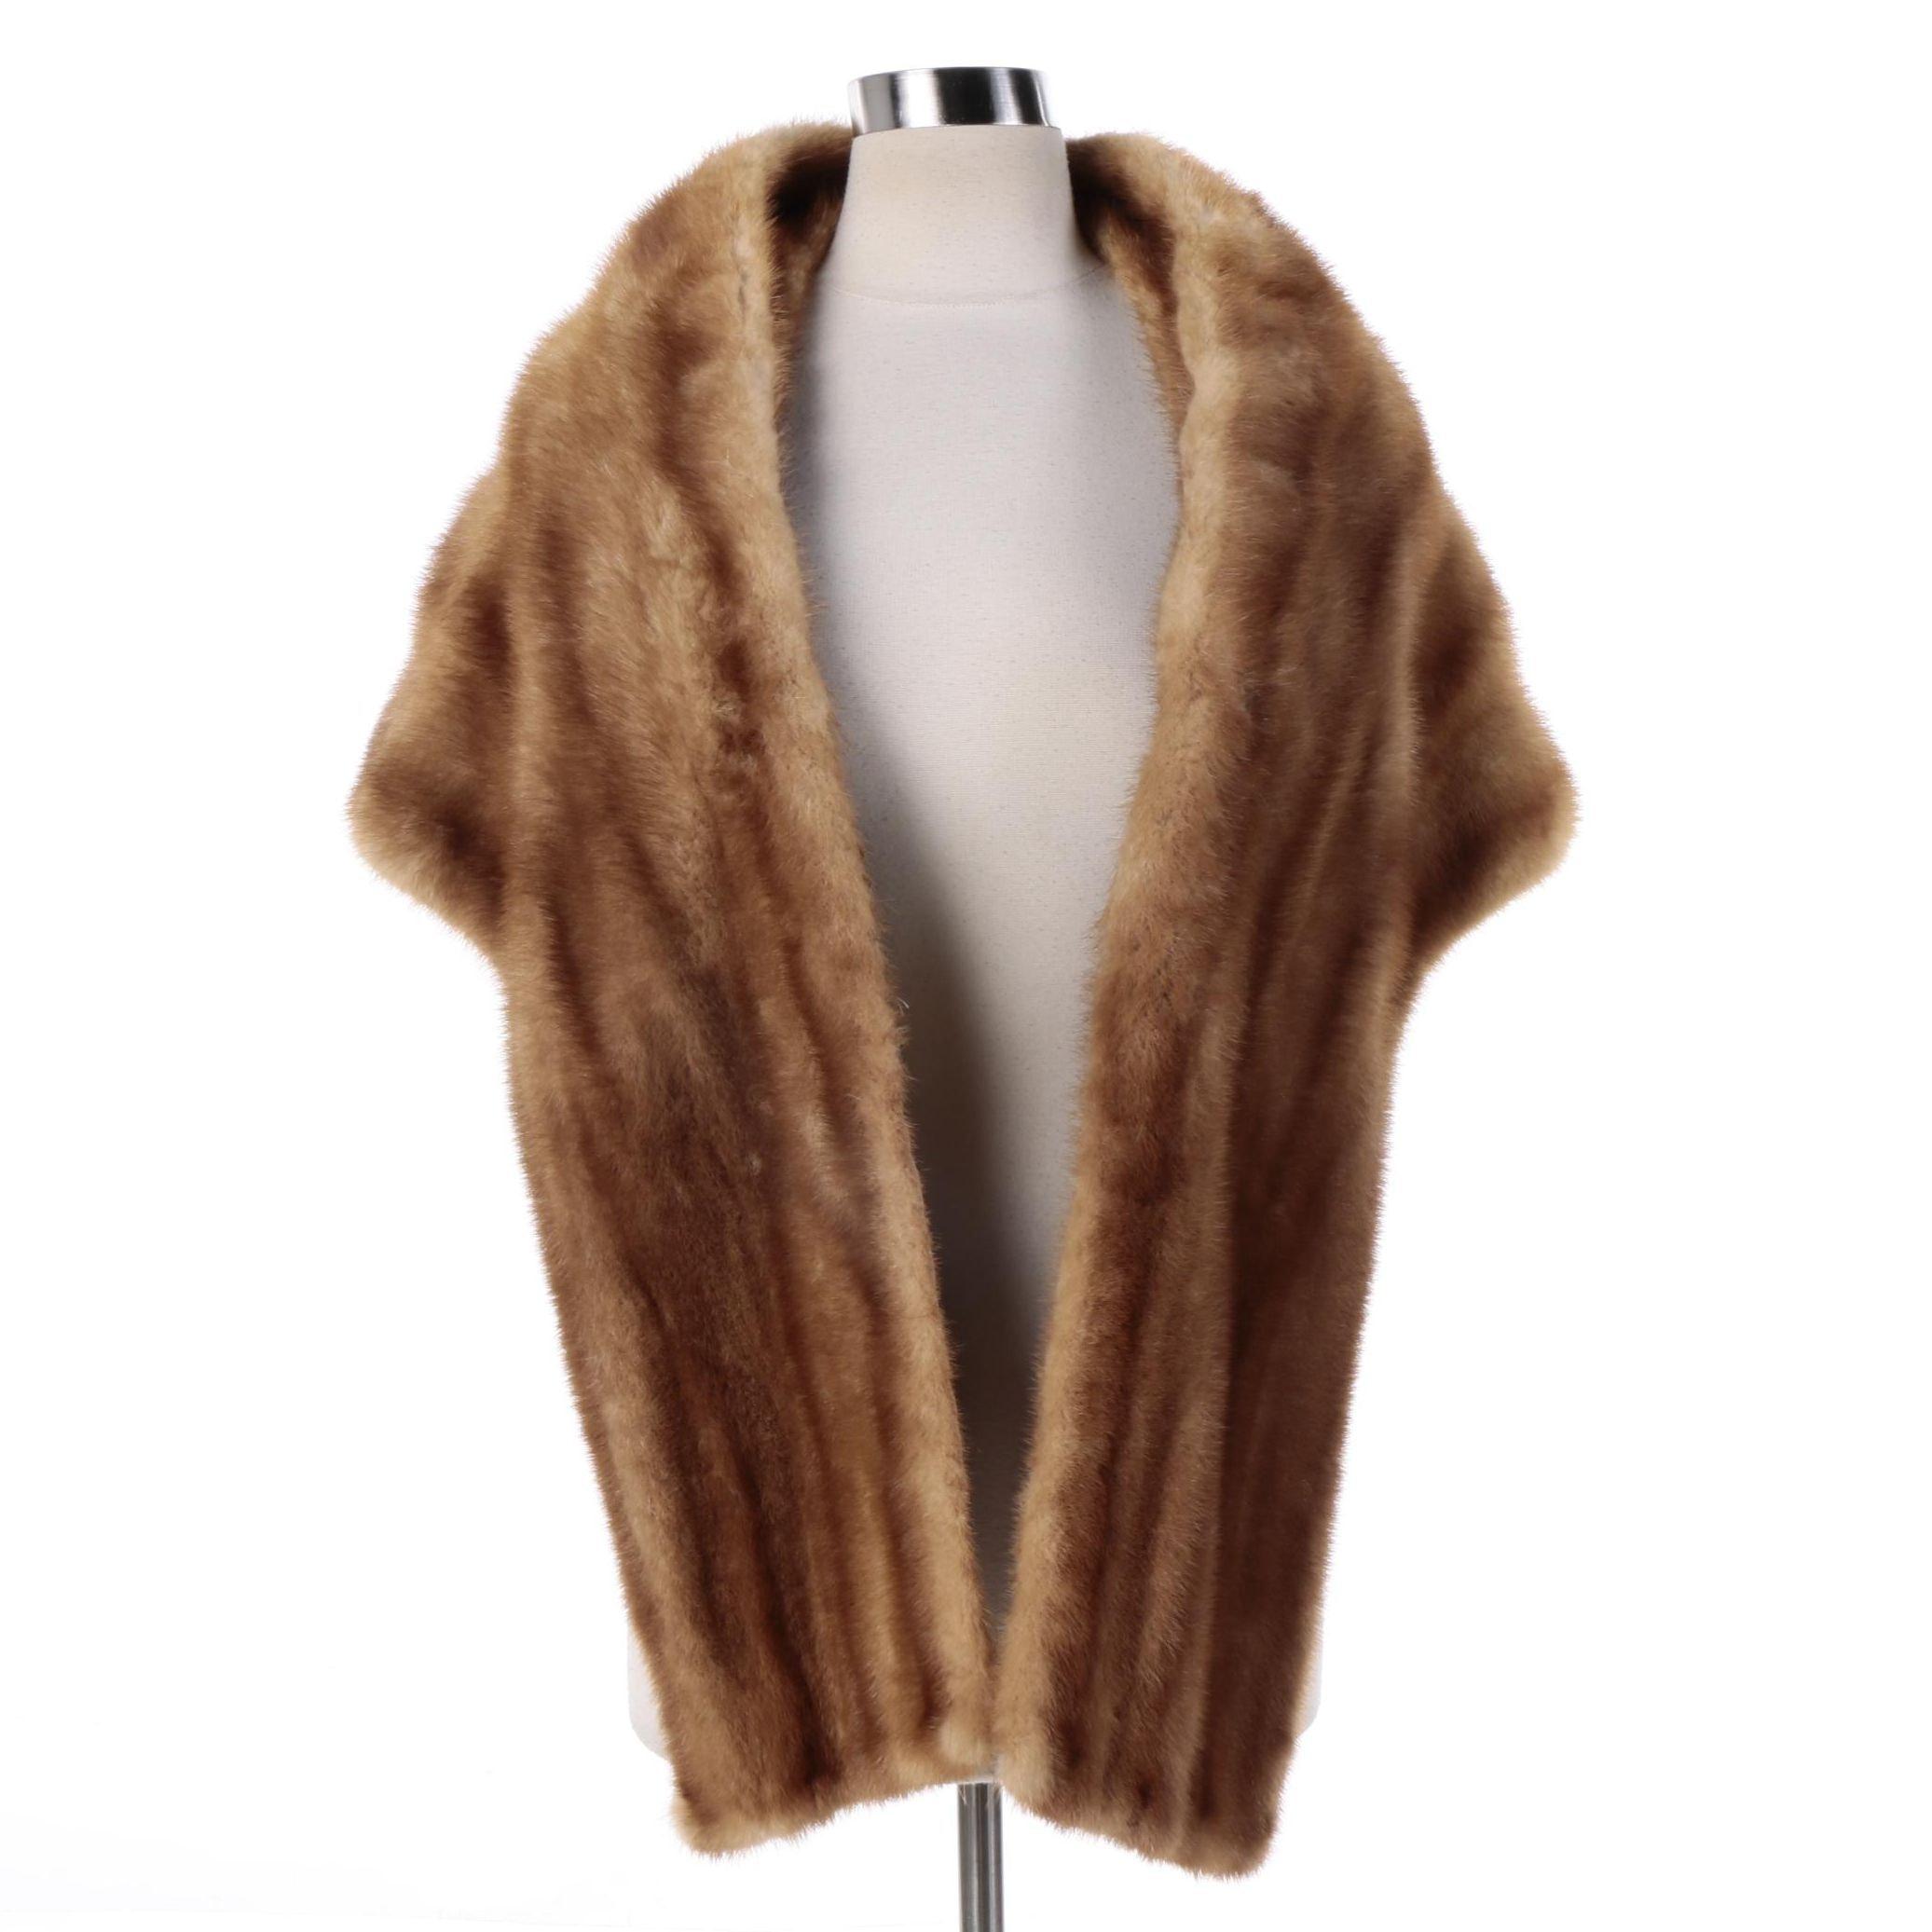 Women's Vintage Eaton's of Canada Mink Fur Stole